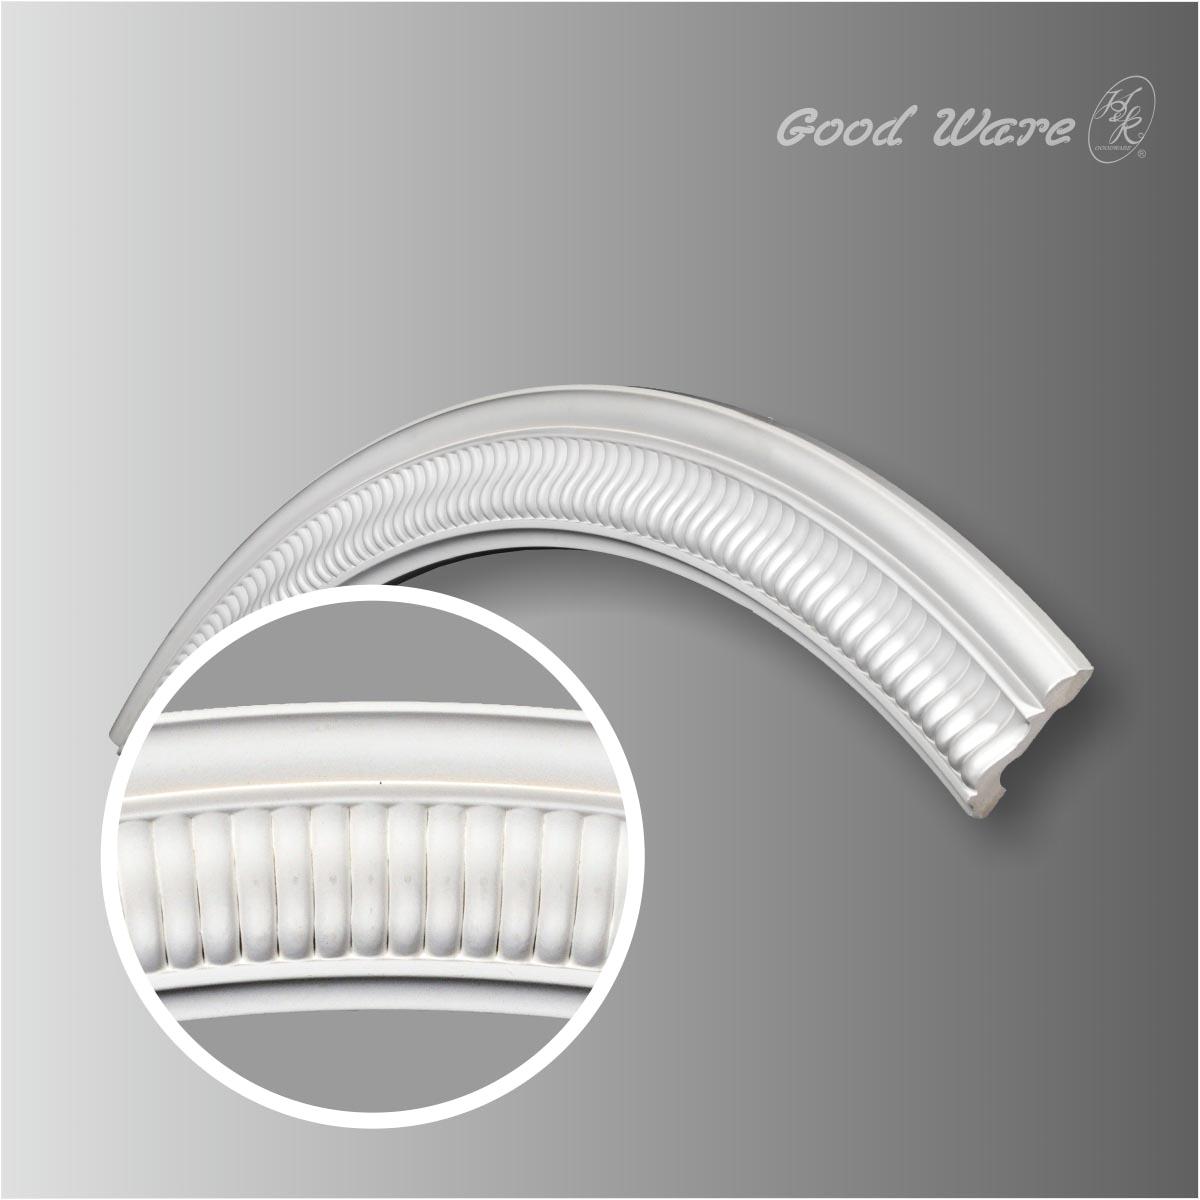 polyurethane decorative circular trim molding